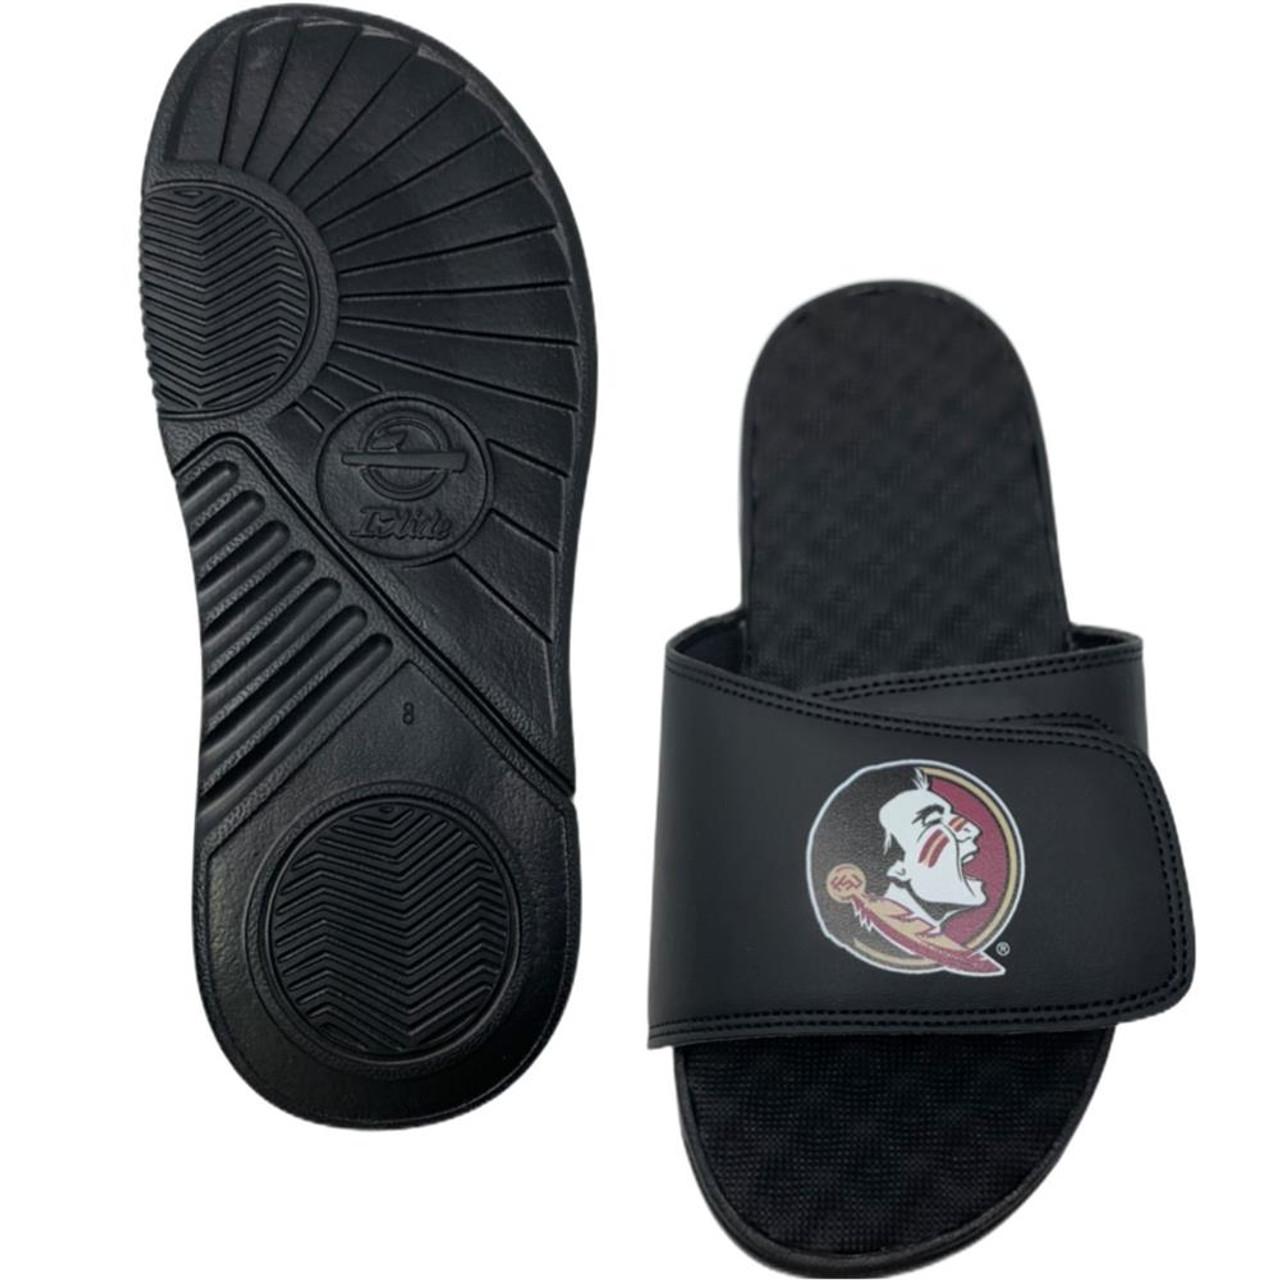 USC Trojans Southern Cal Slides ISlide Primary Adjustable Sandals